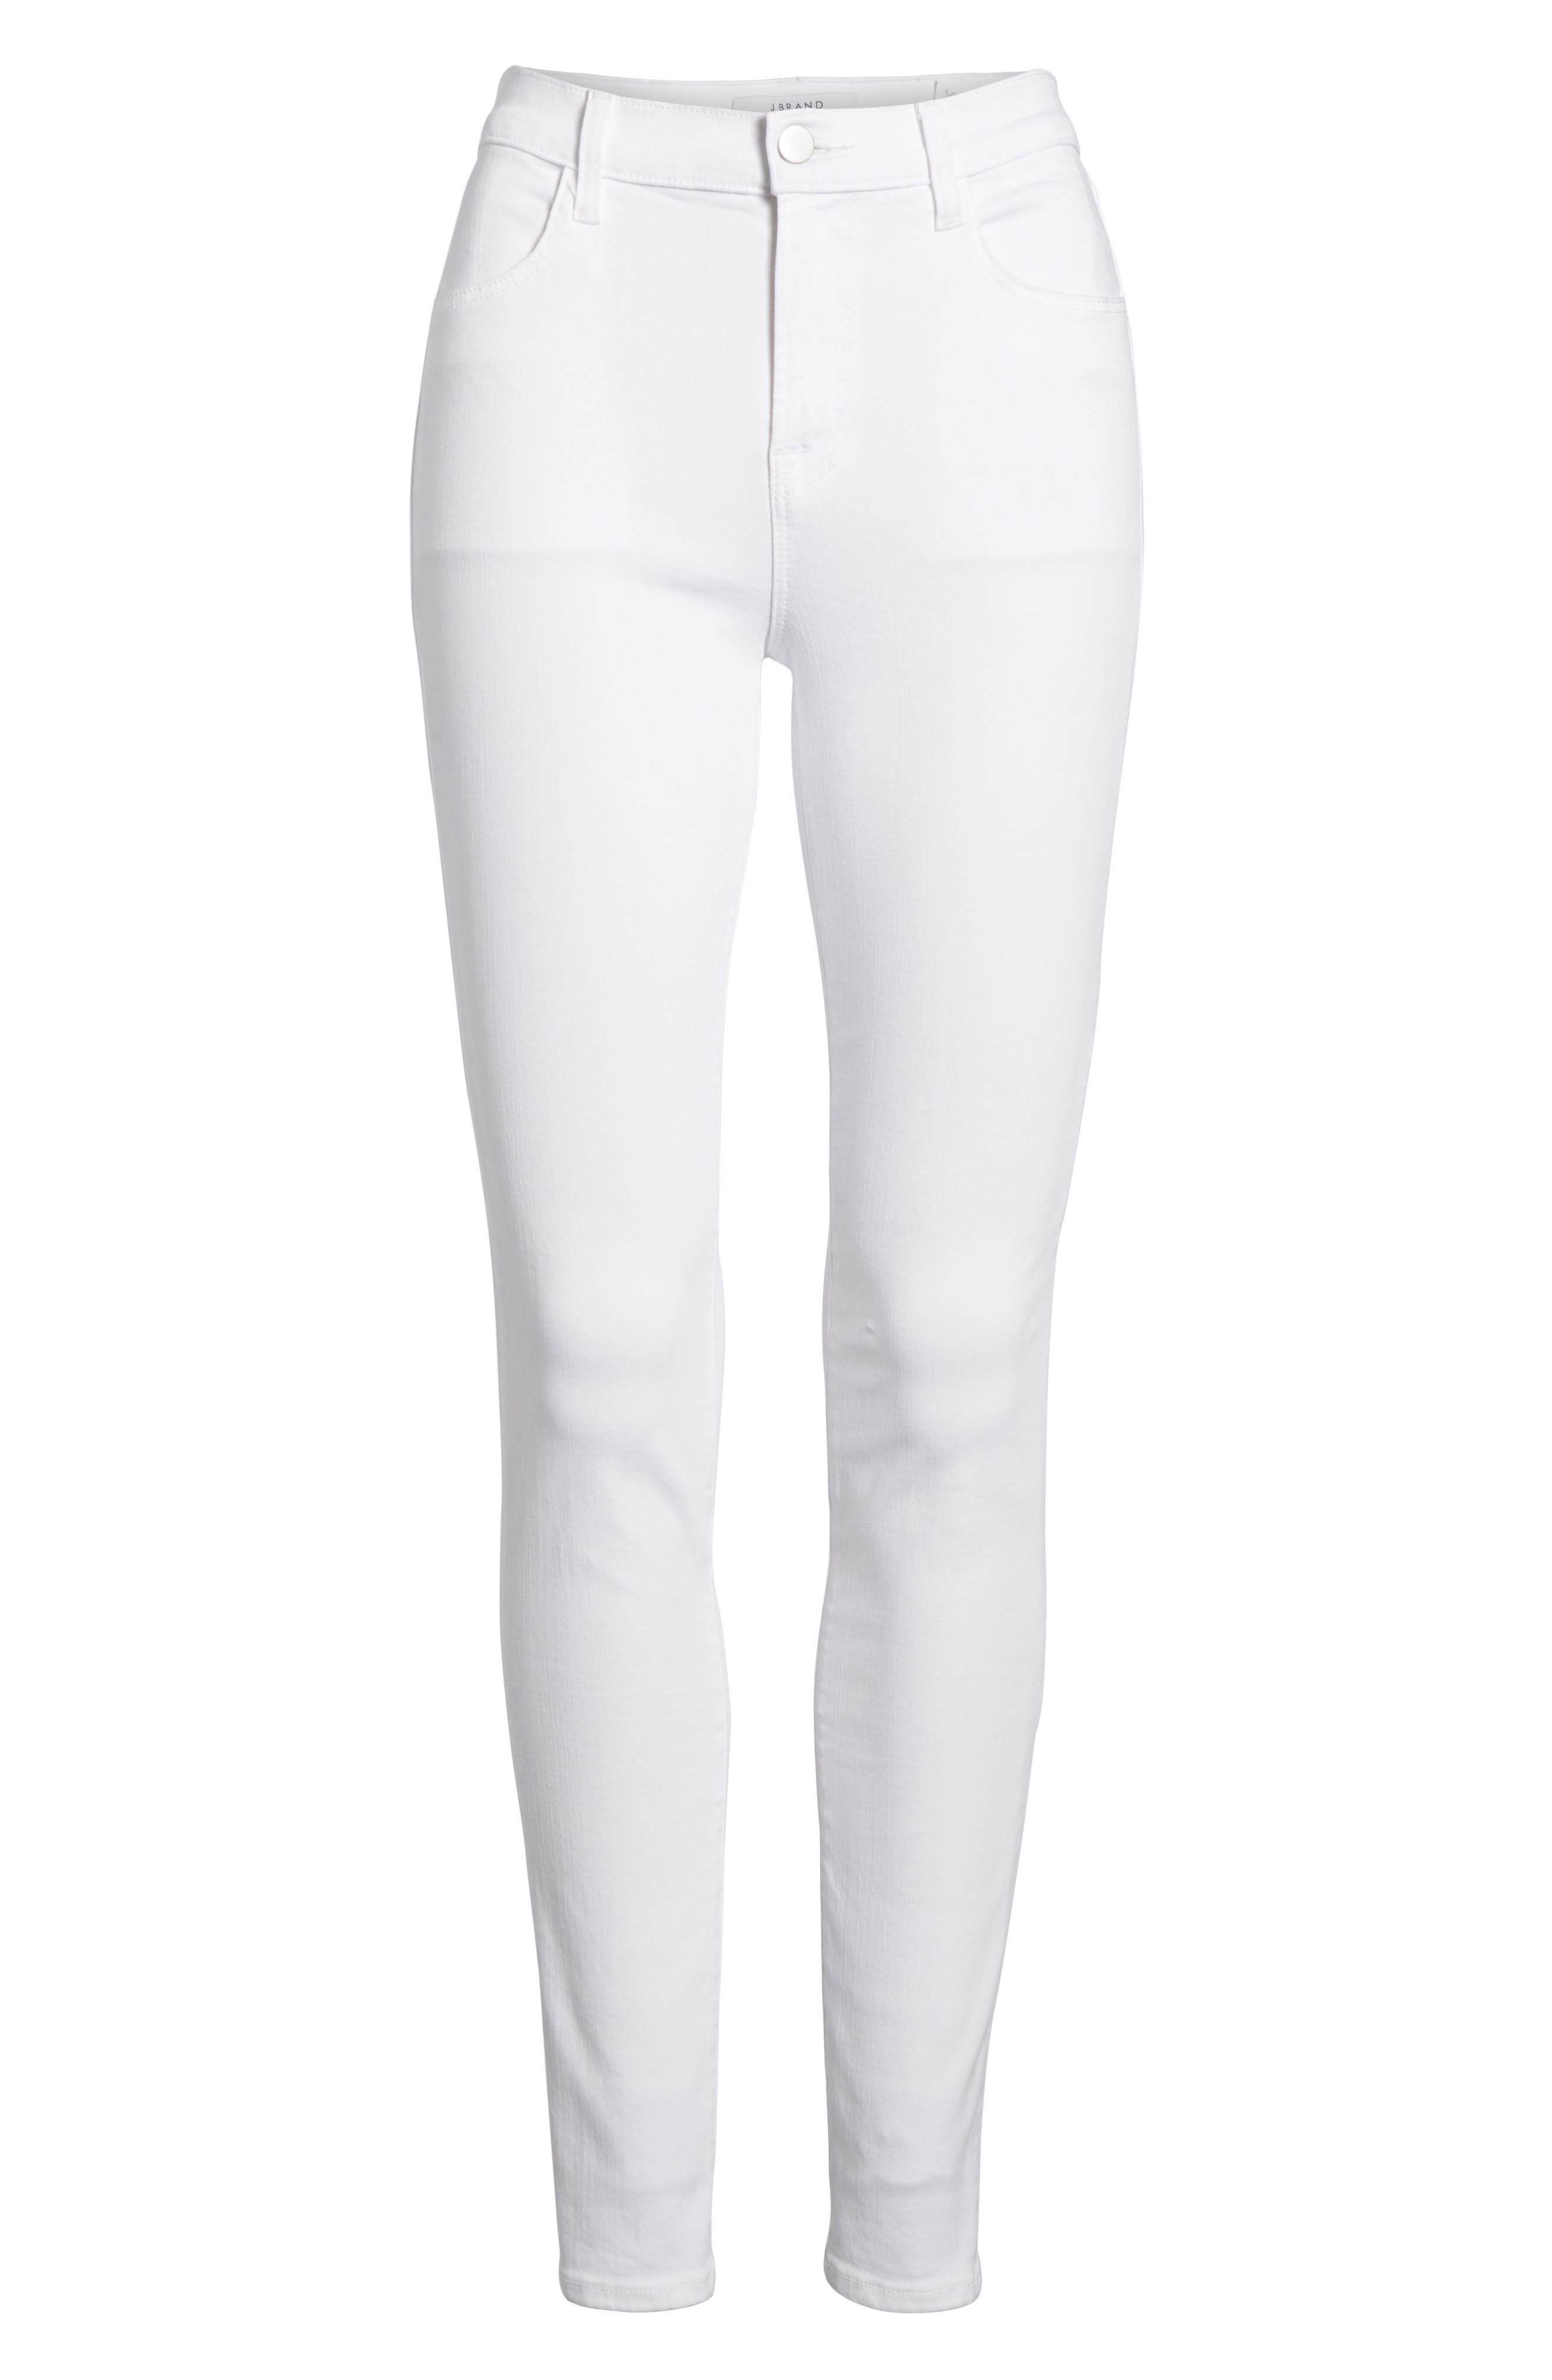 Maria High Waist Skinny Jeans,                             Alternate thumbnail 7, color,                             White